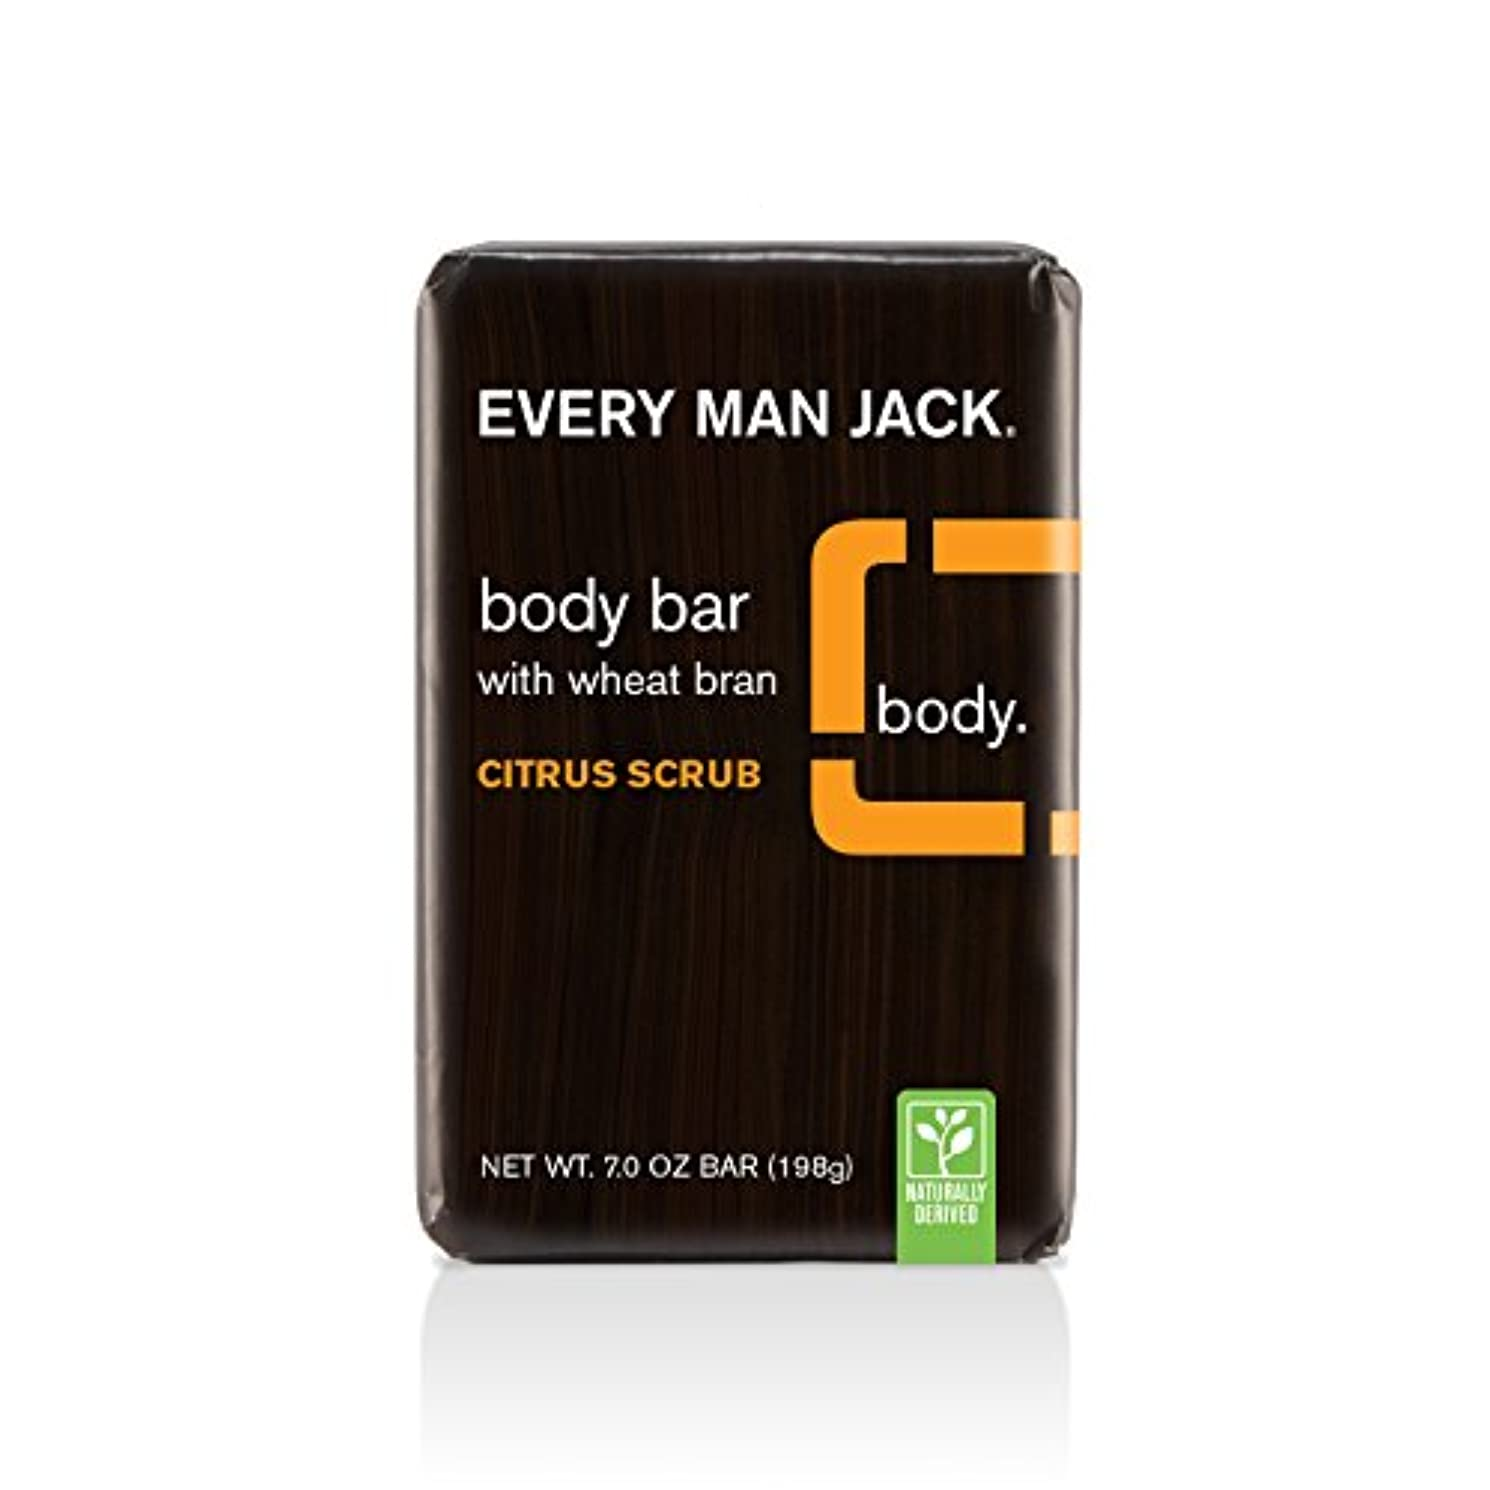 後世笑パスタ海外直送品Body Bar Soap, Citrus Scrub 7 oz by Every Man Jack